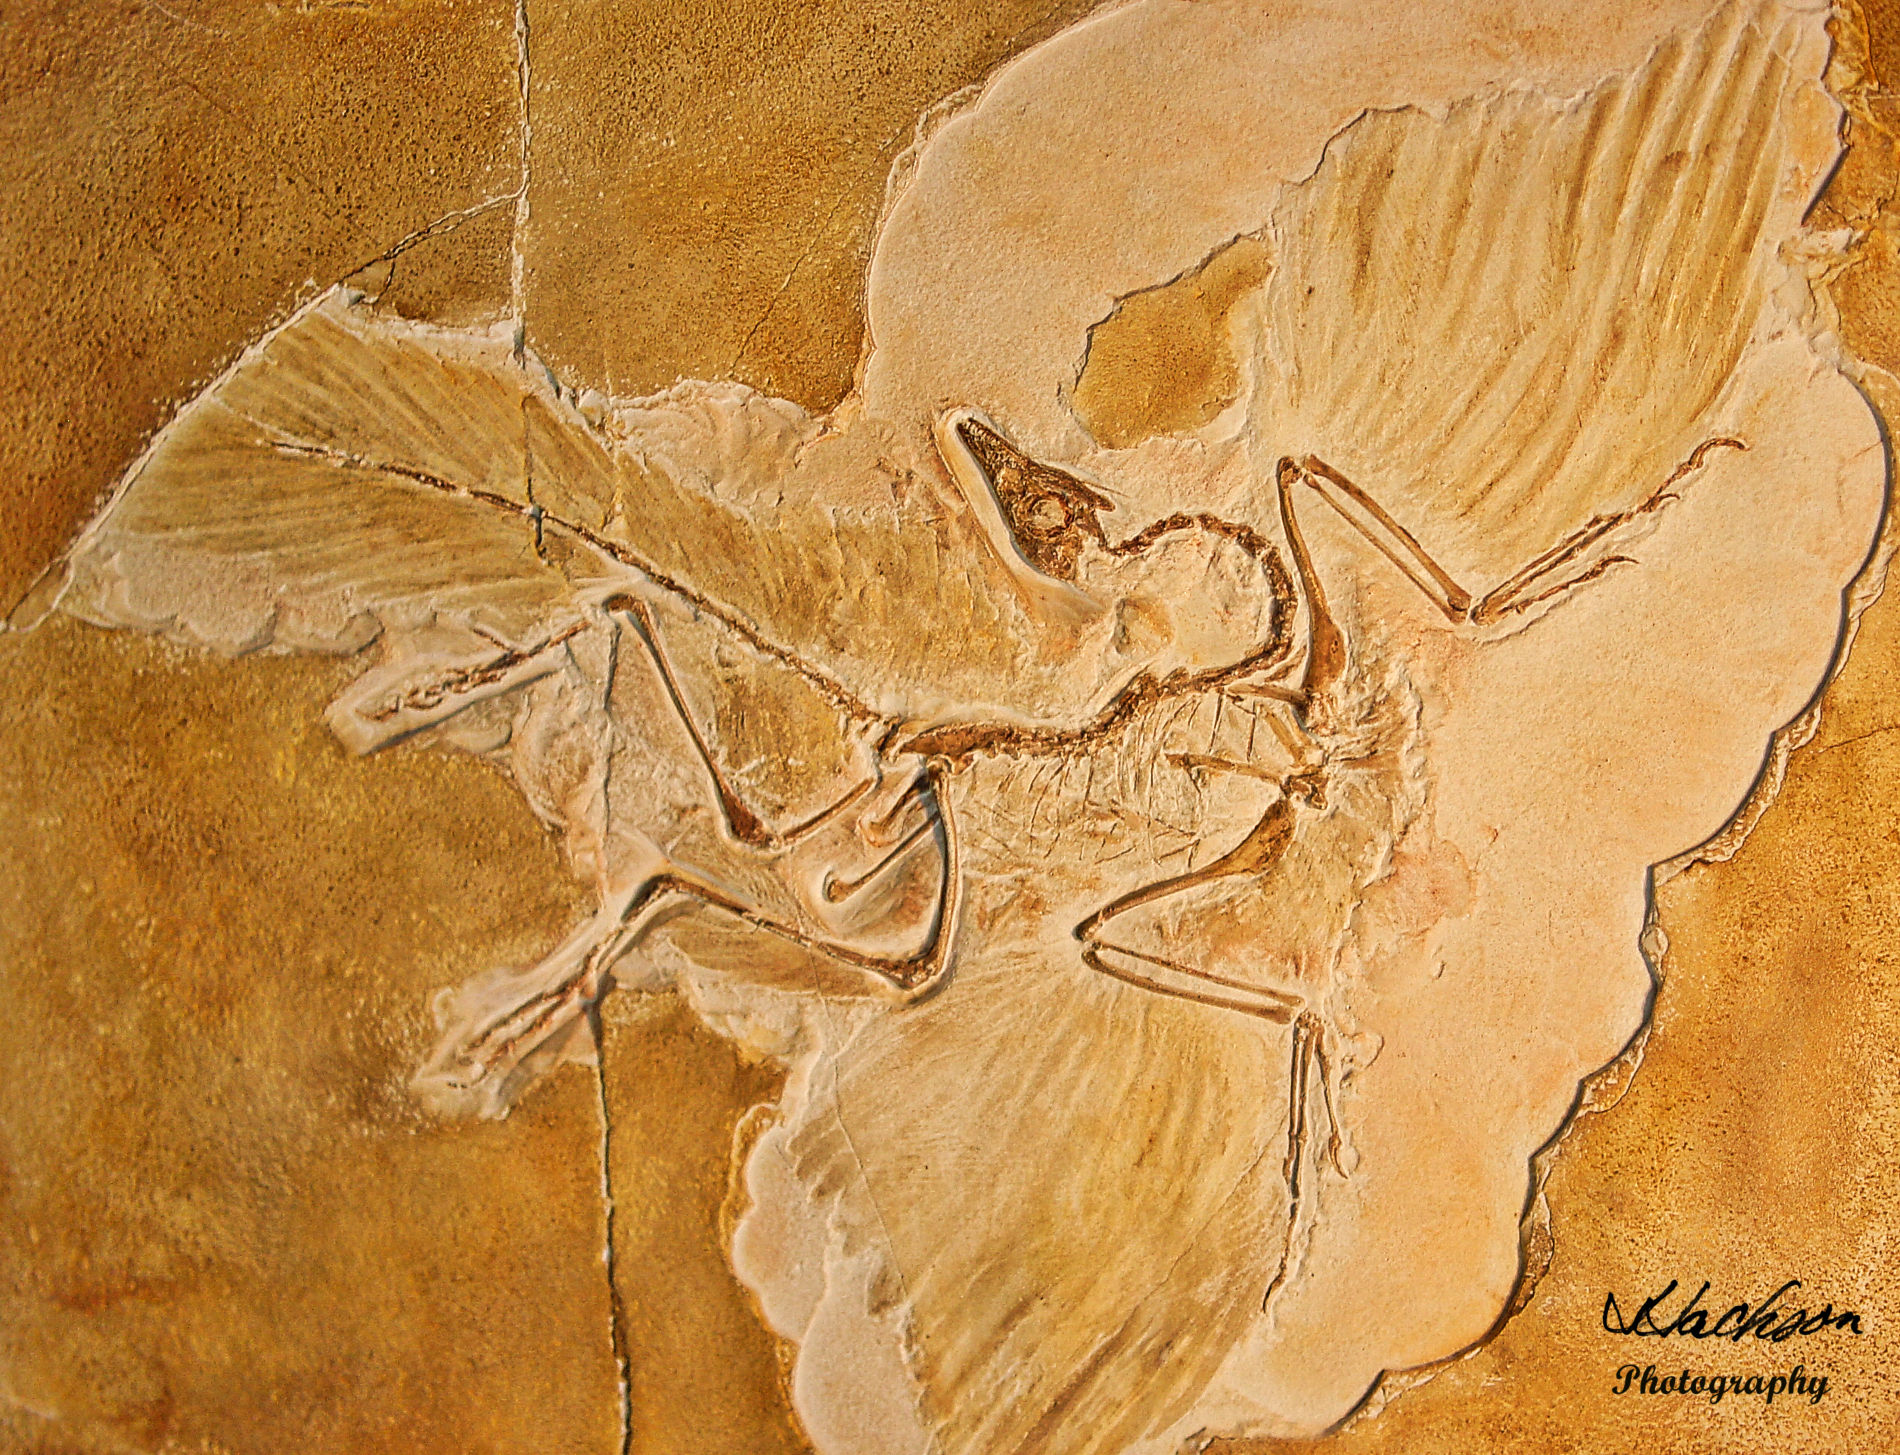 Photo of Solnhofen Bird evolved from a lizard